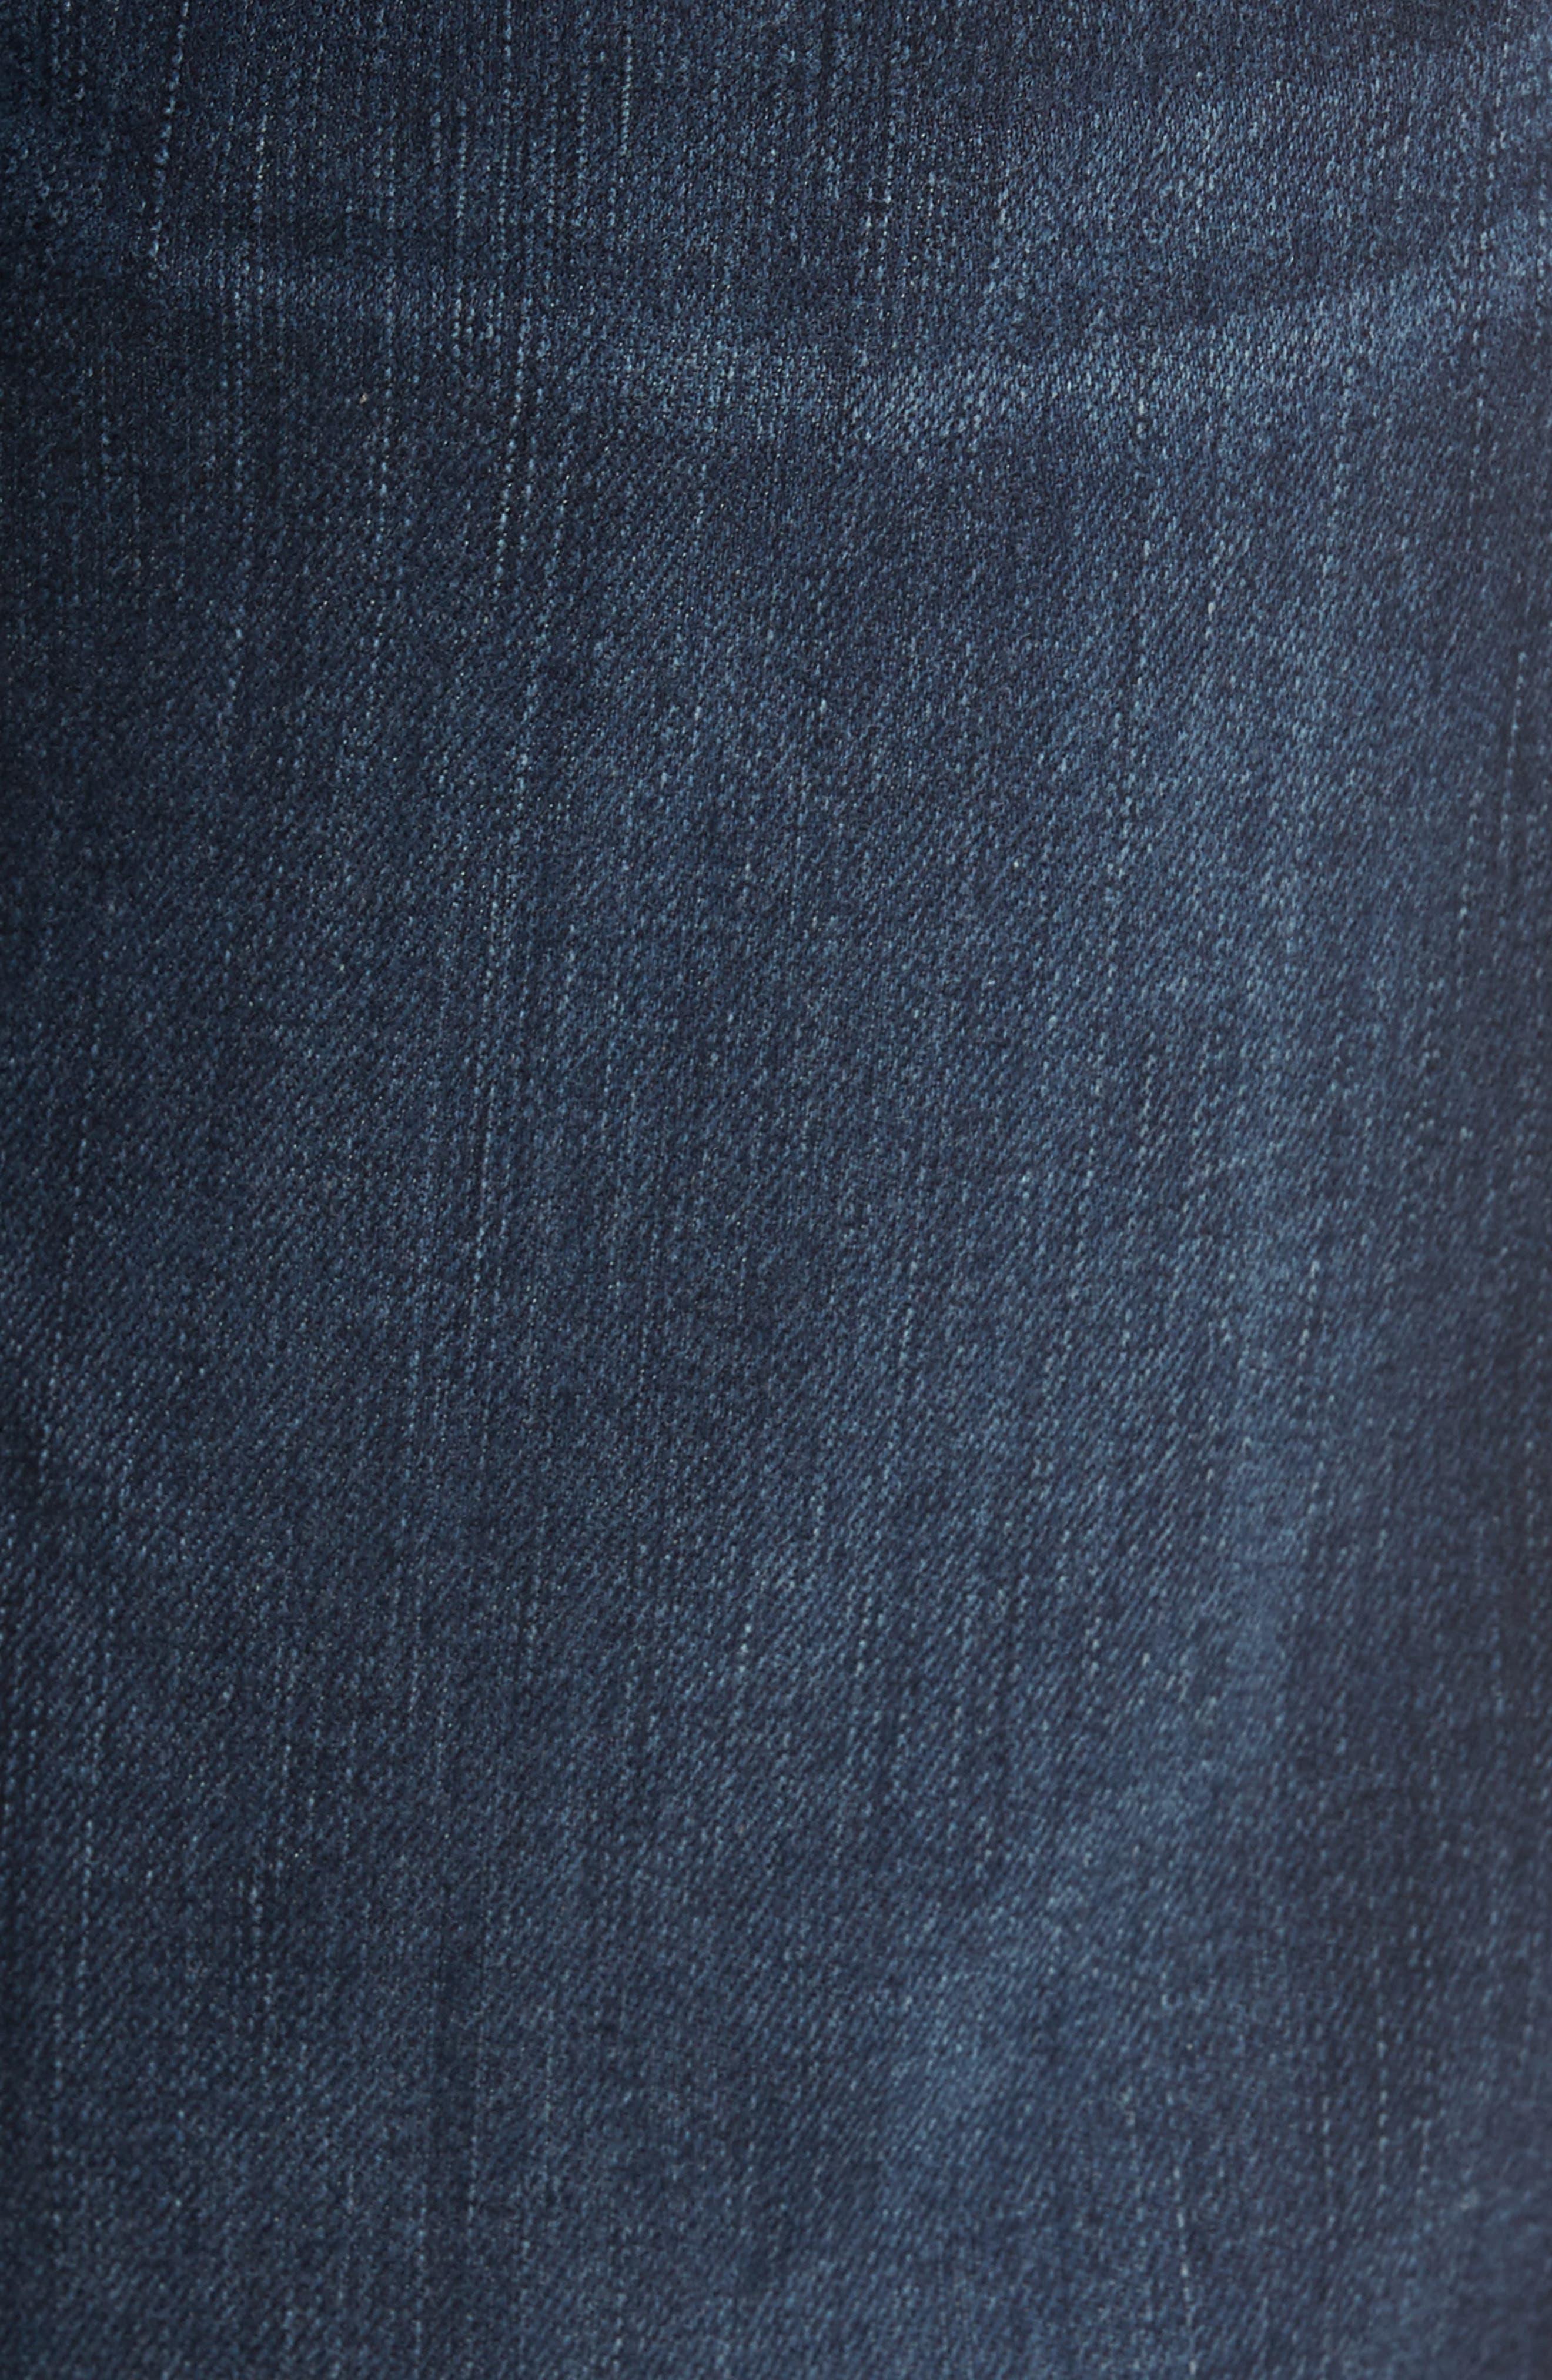 Luxe Performance - Carsen Straight Leg Jeans,                             Alternate thumbnail 5, color,                             Dark Current